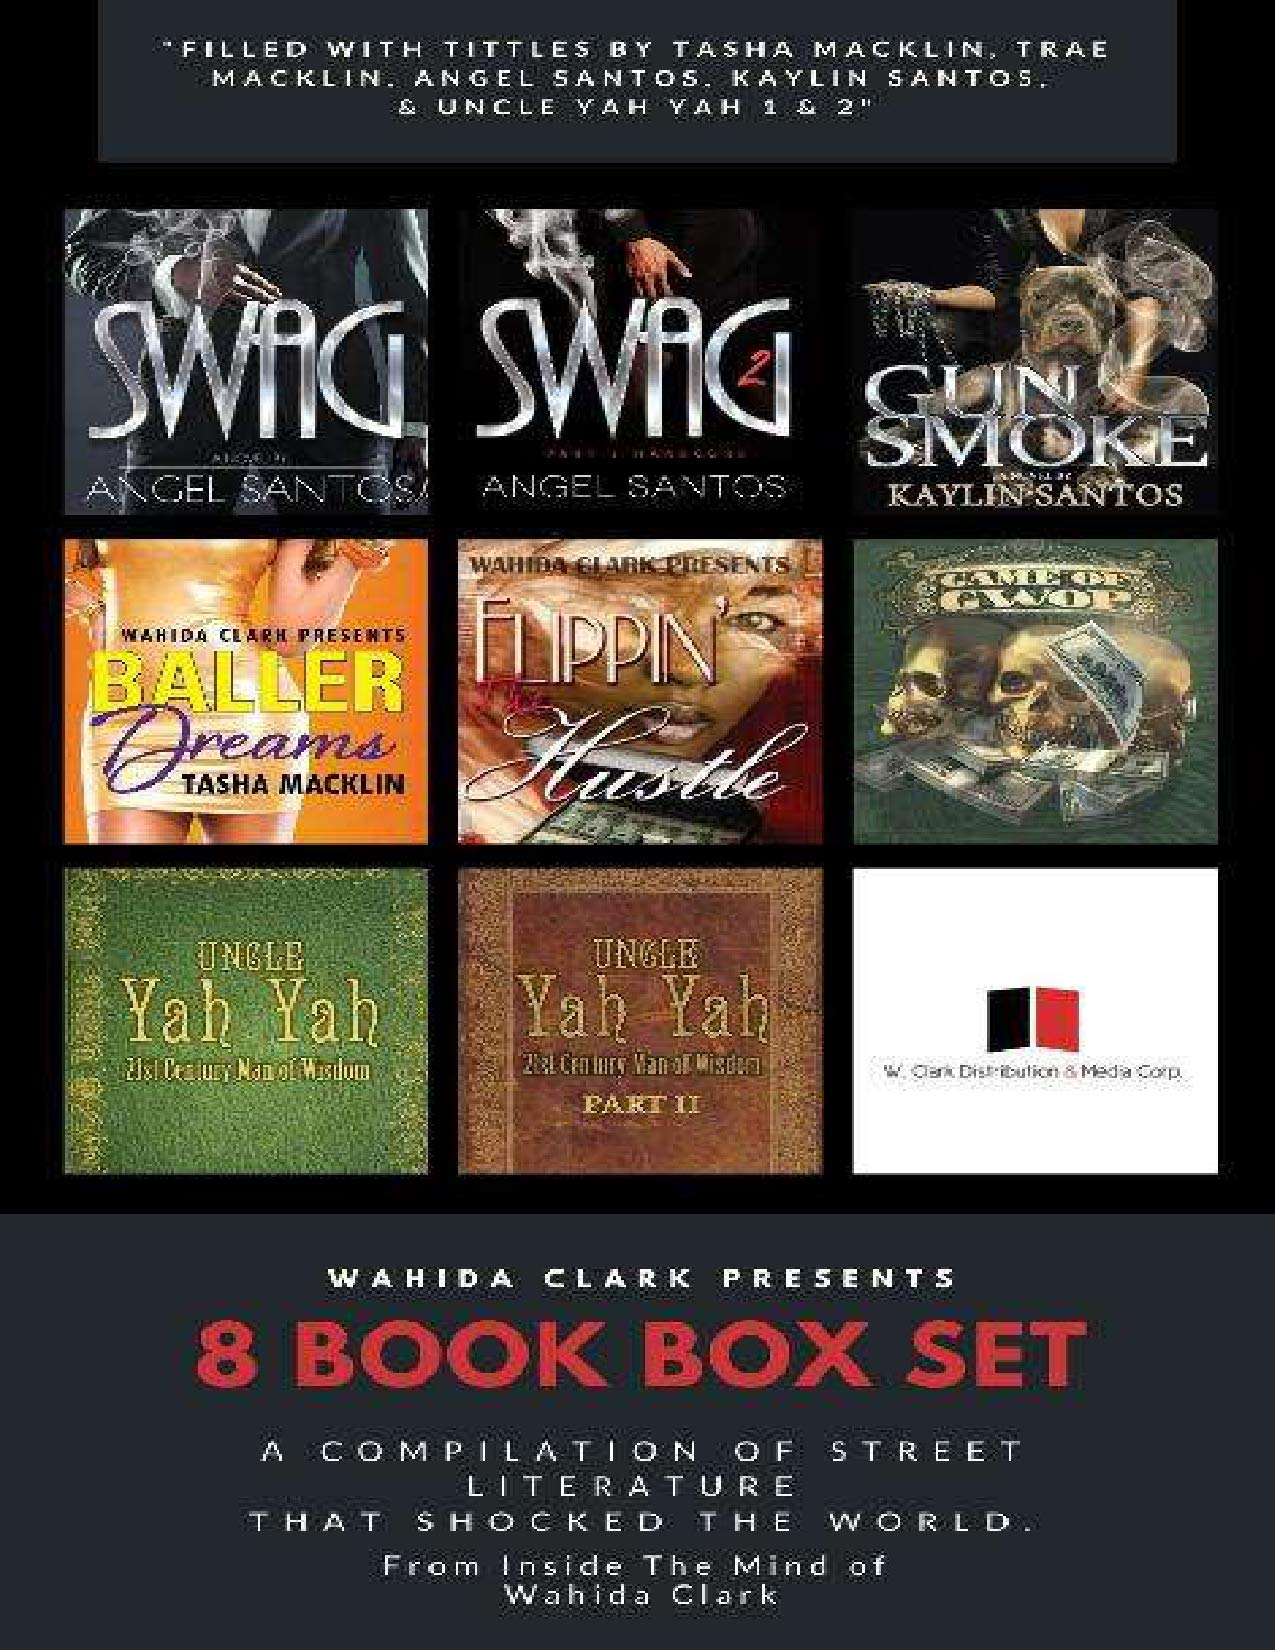 Wahida Clark Presents: 8 Book Box Set: Limited Edition